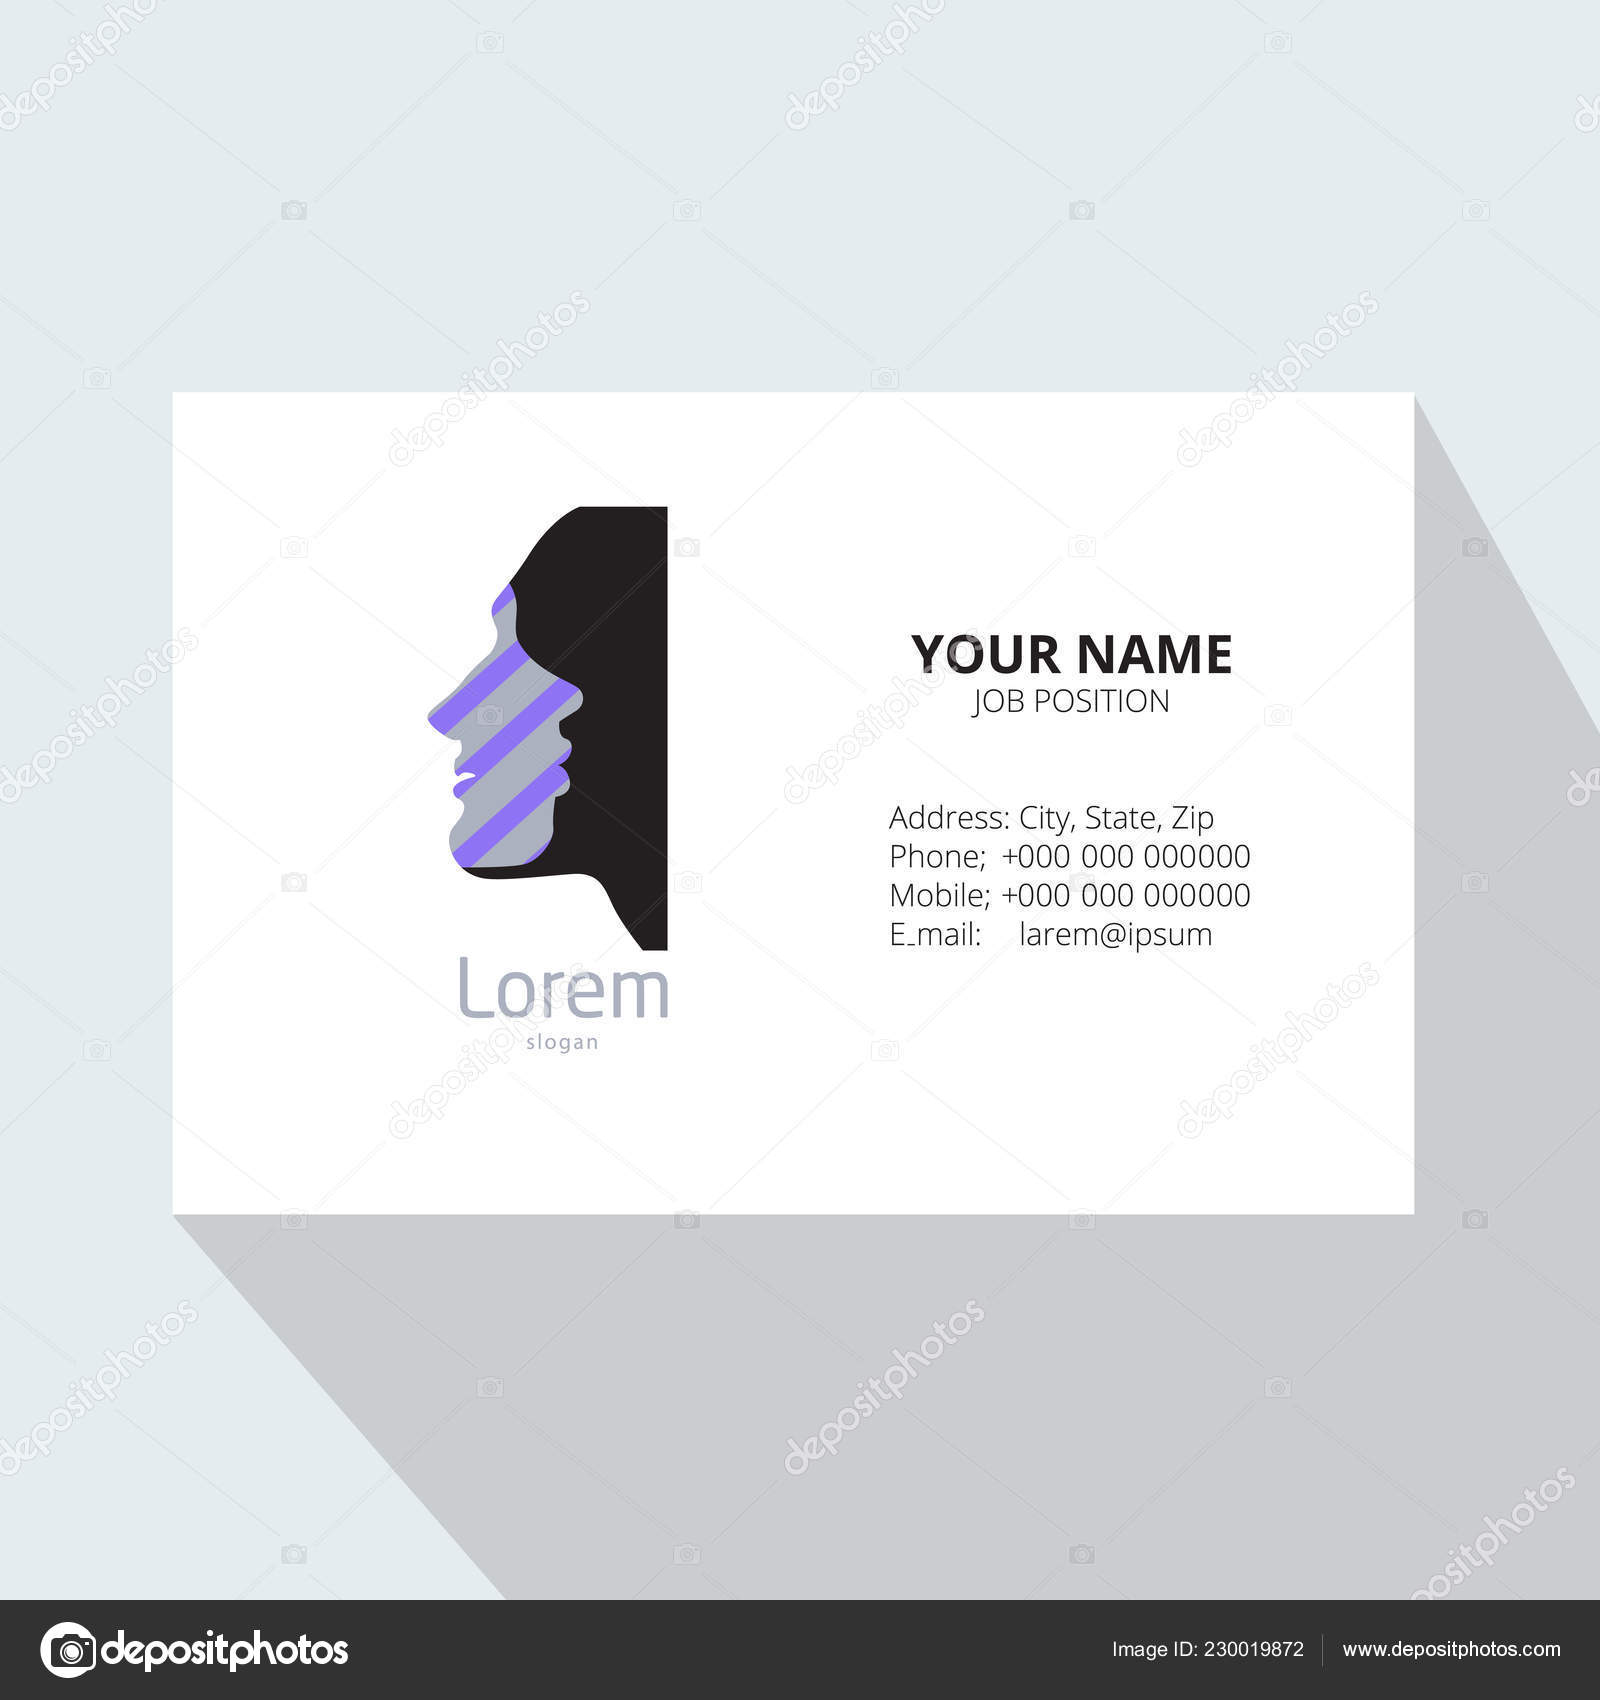 Design Logotipo Cartao Visita Modelo Com Rostos Masculinos